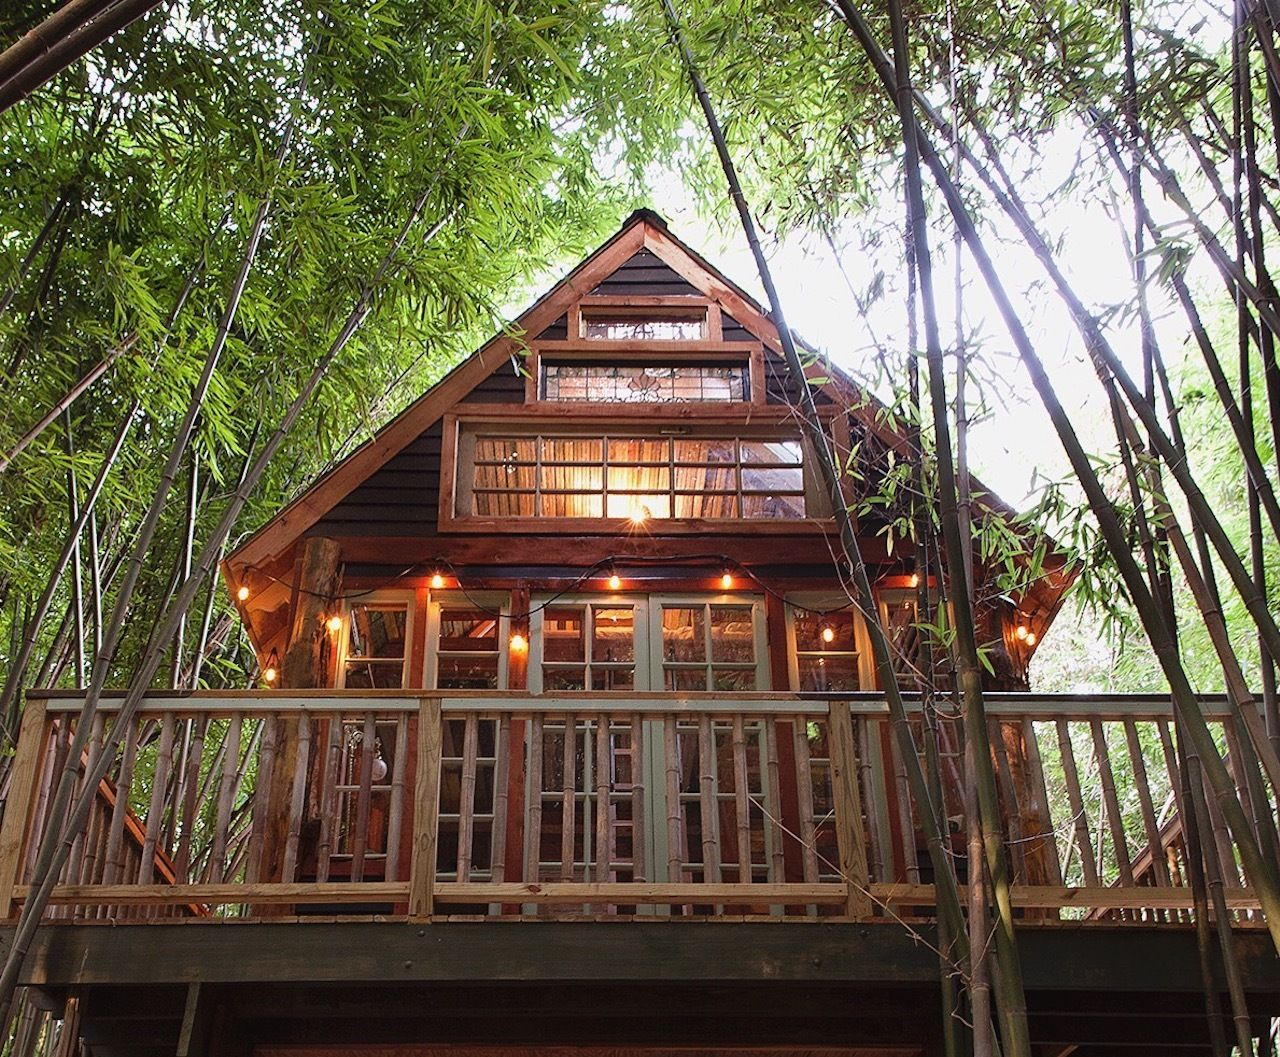 alpaca-treehouse-worlds-most-amazing-vacation-rentals, World's Most Amazing Vacation Rentals